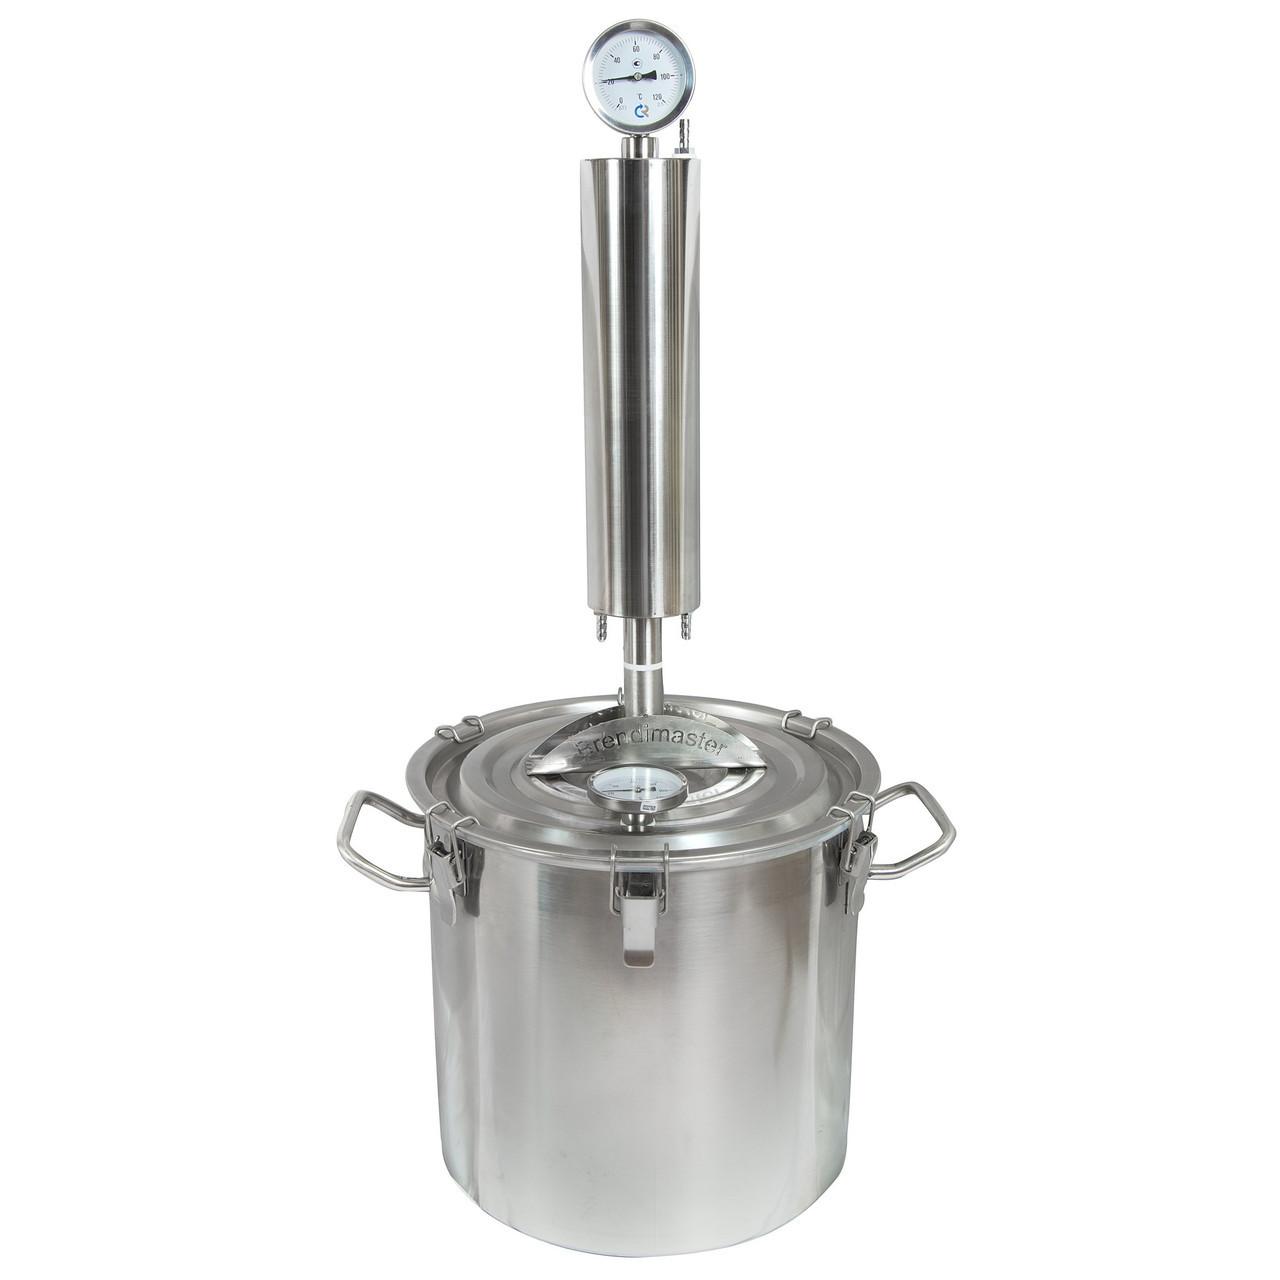 Дистиллятор Brendimaster X.O. с баком на 37 литров